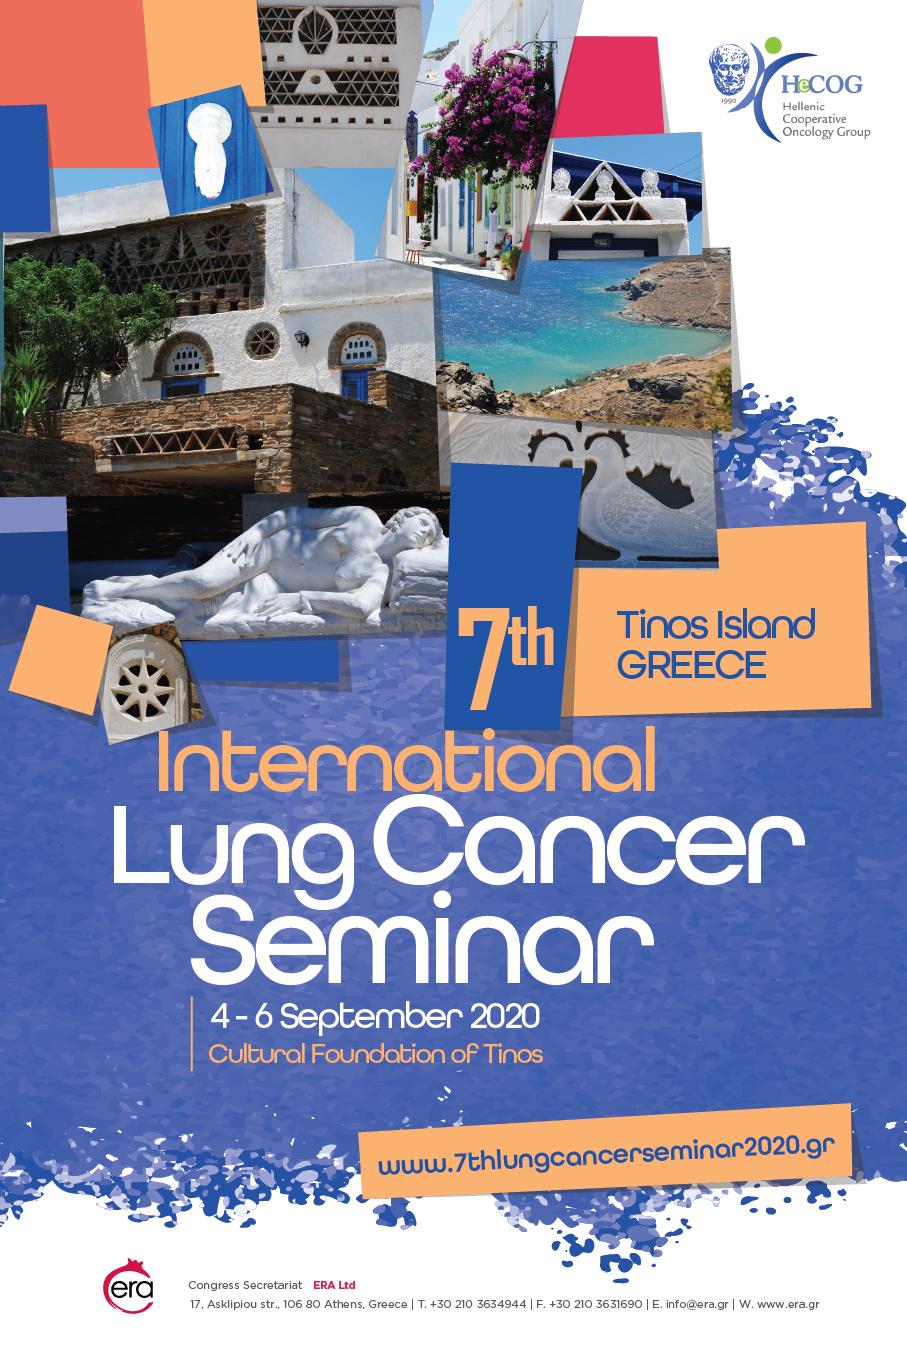 7th International Lung Cancer Seminar | ERA Ltd. Congress Organizers